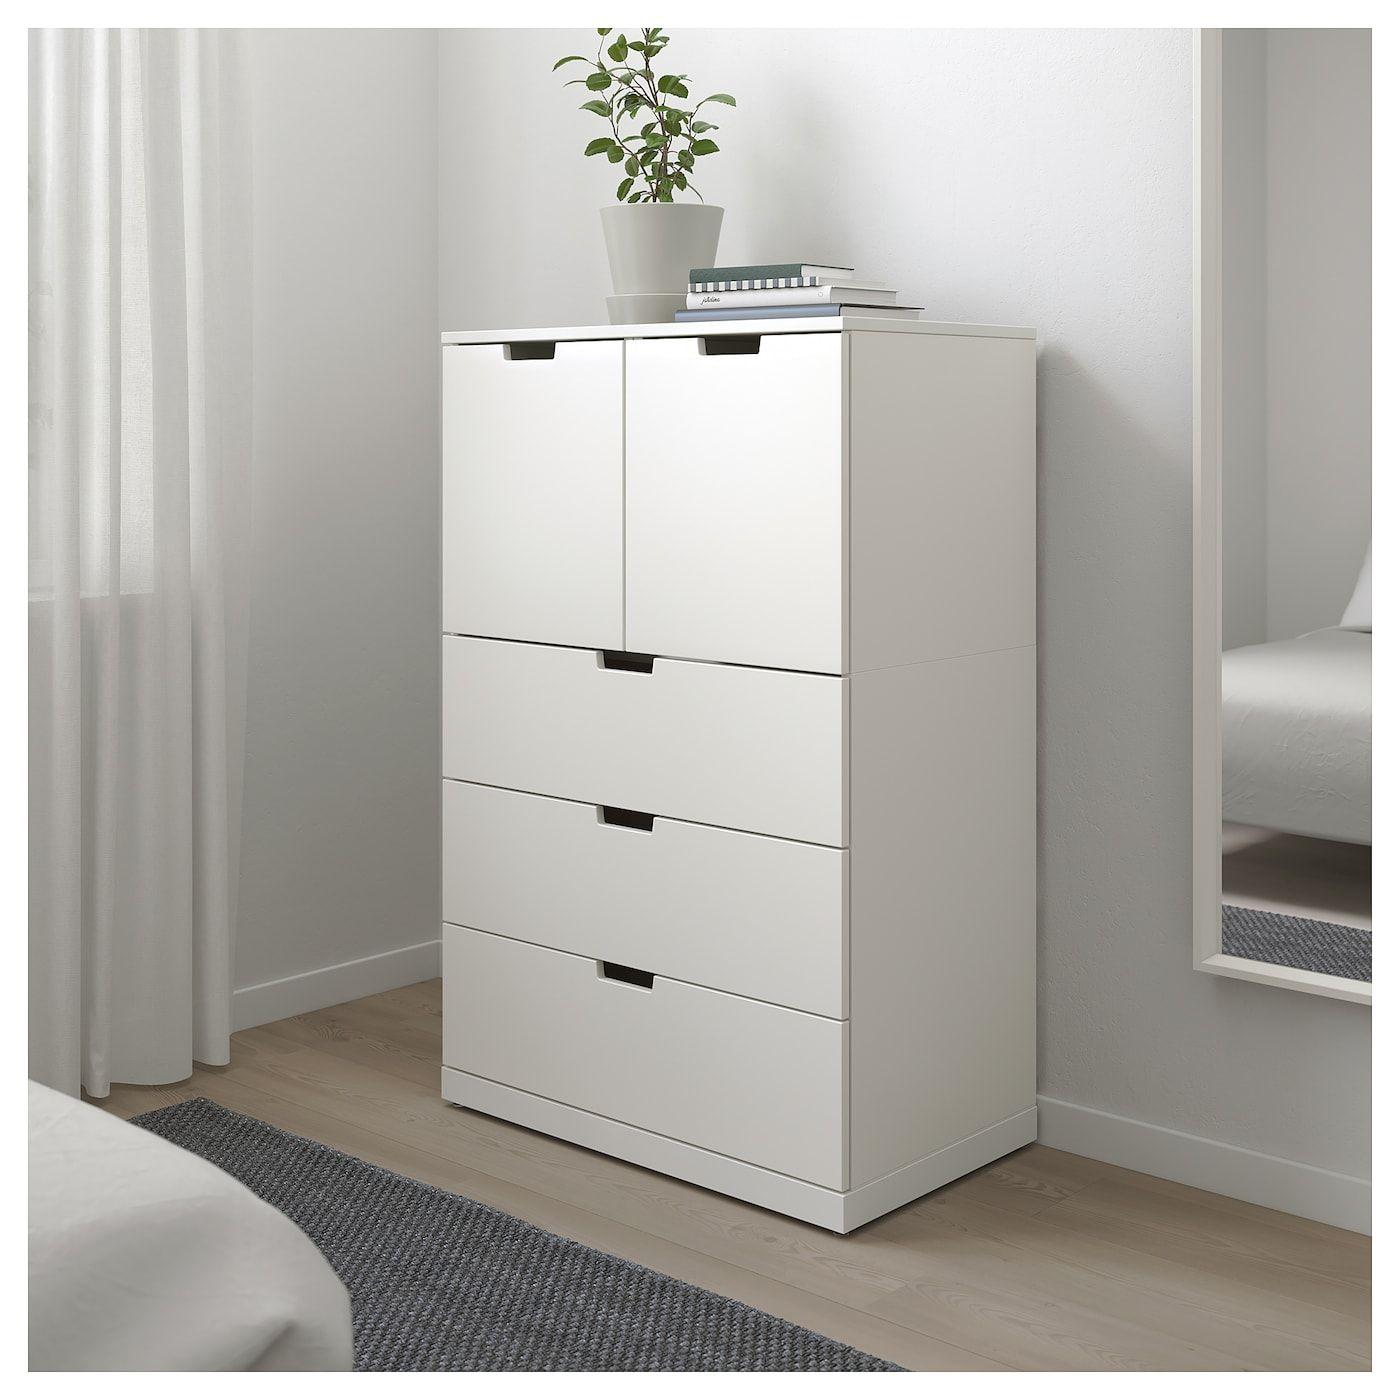 Ikea Us Furniture And Home Furnishings Ikea Nordli Ikea Chest Of Drawers [ 1400 x 1400 Pixel ]